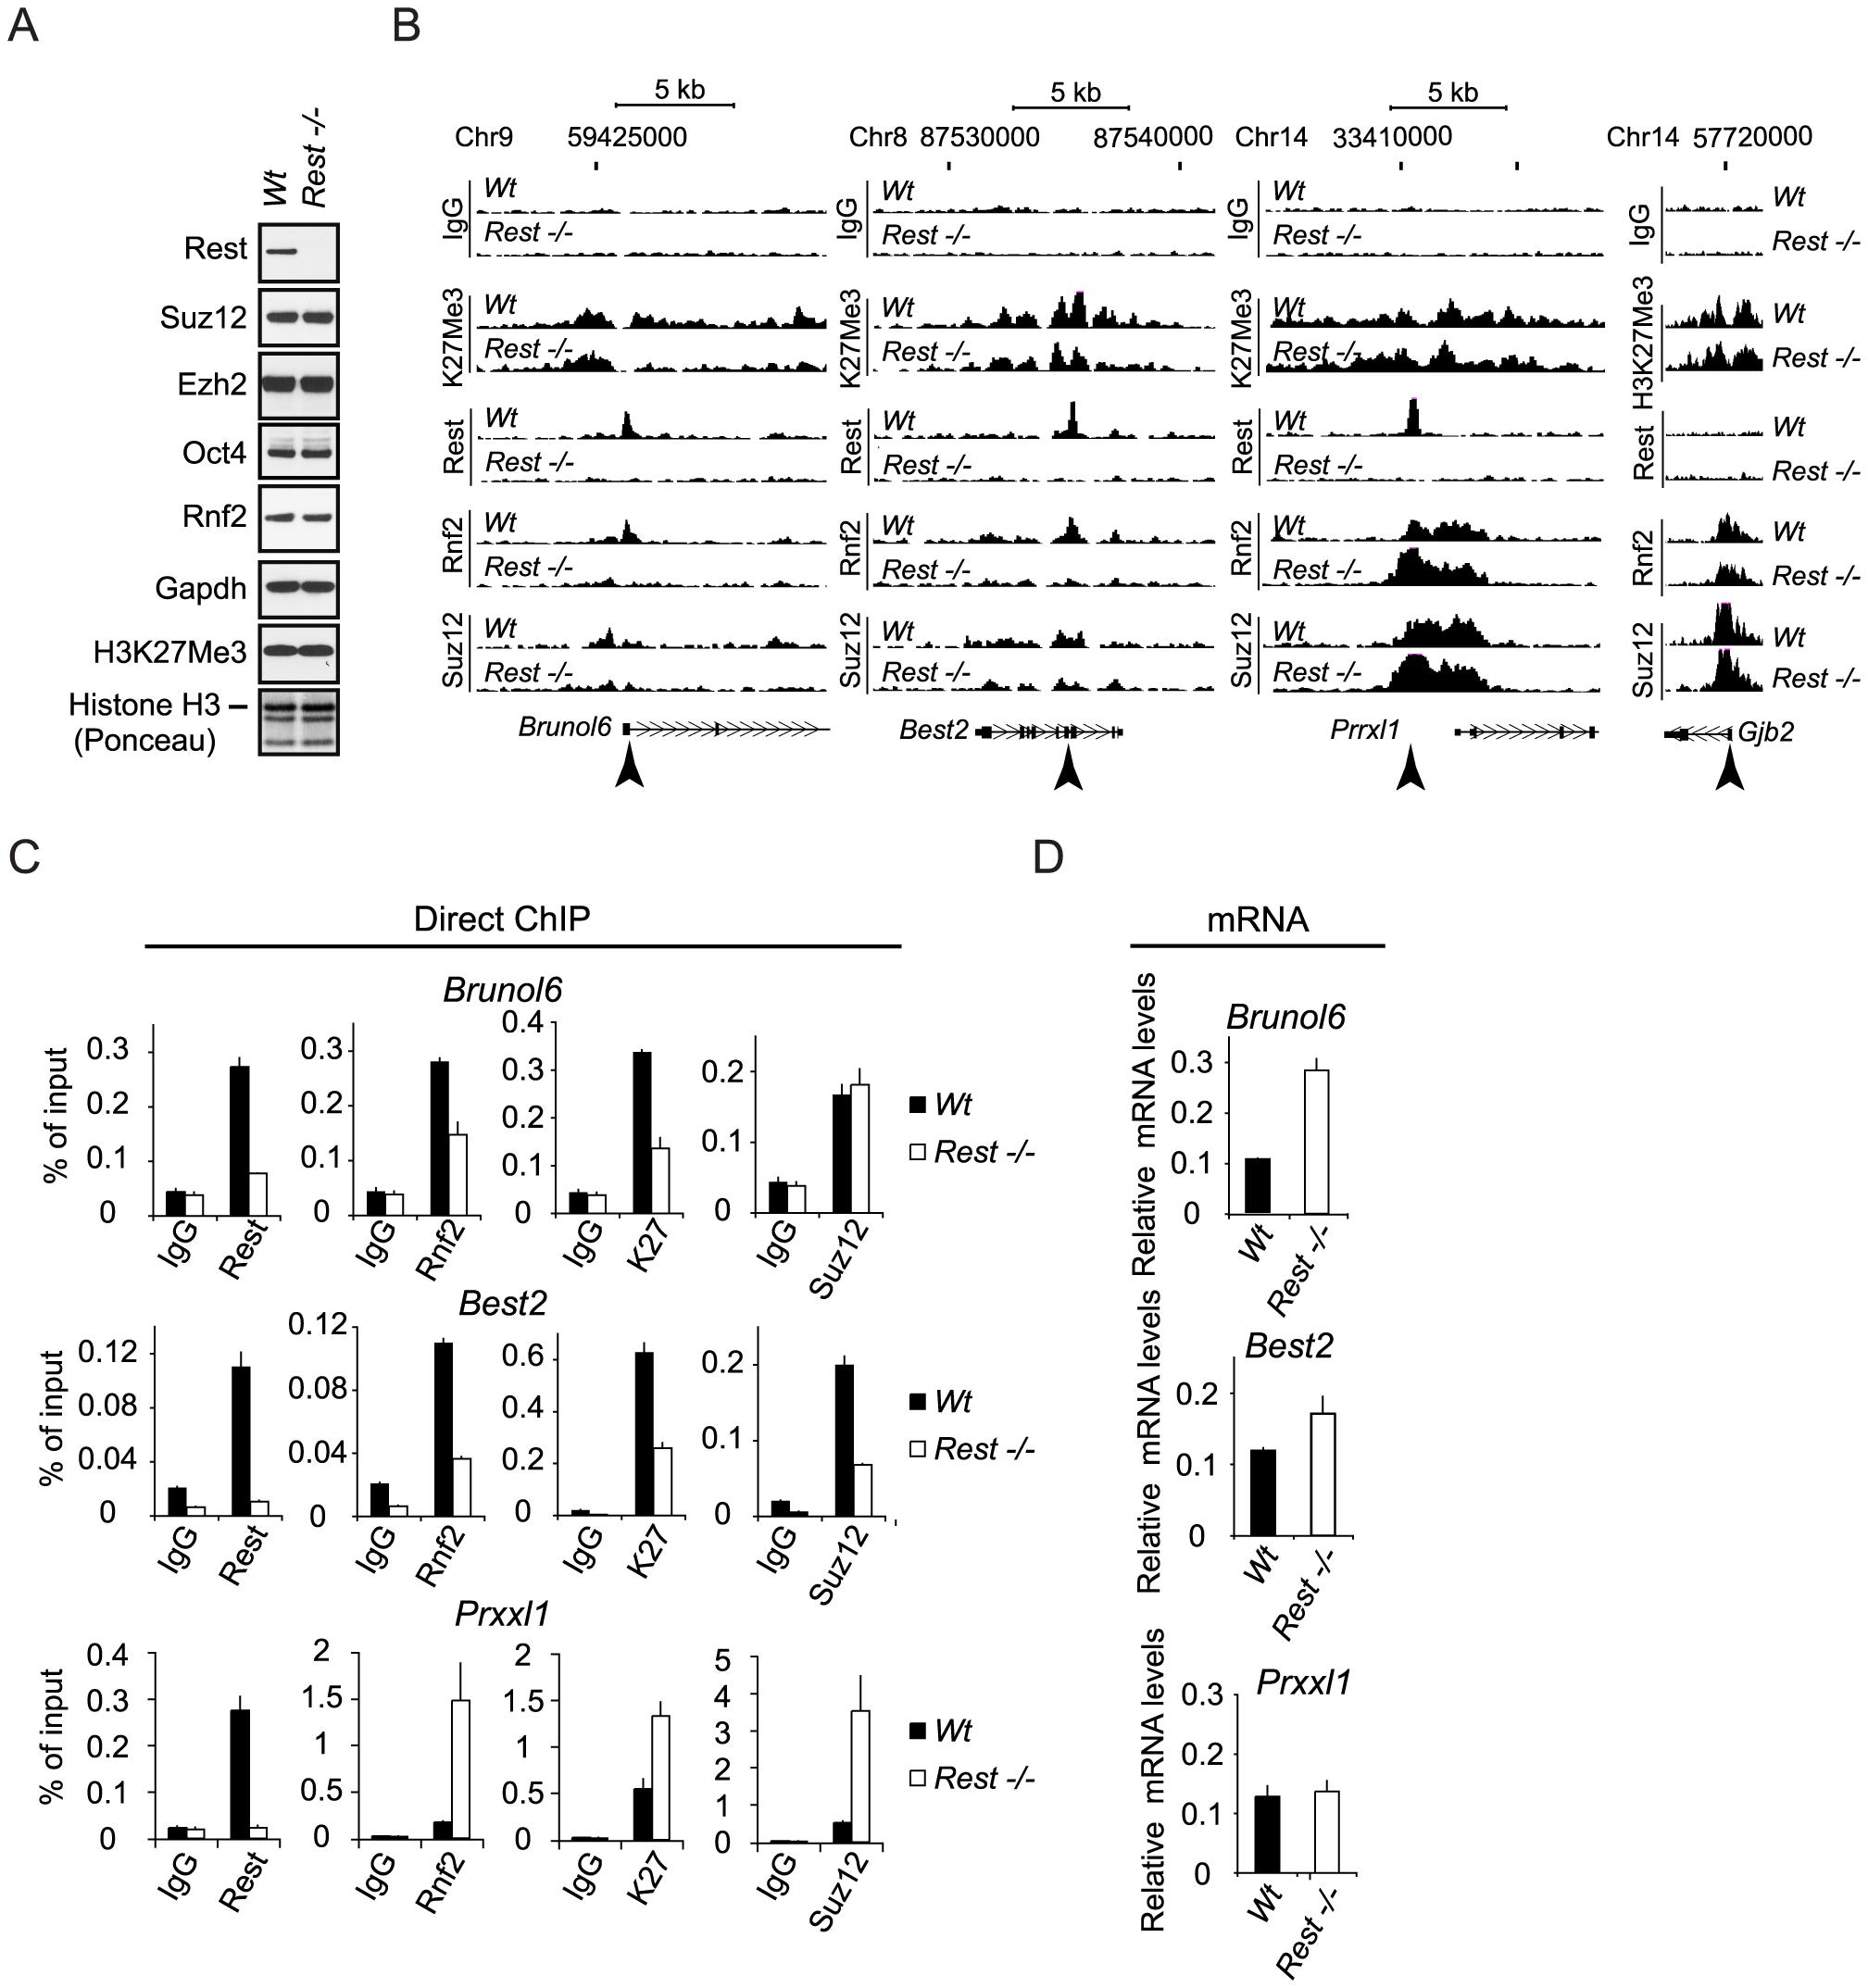 Rest regulates recruitment of PRC1 and PRC2 at specific genomic loci.